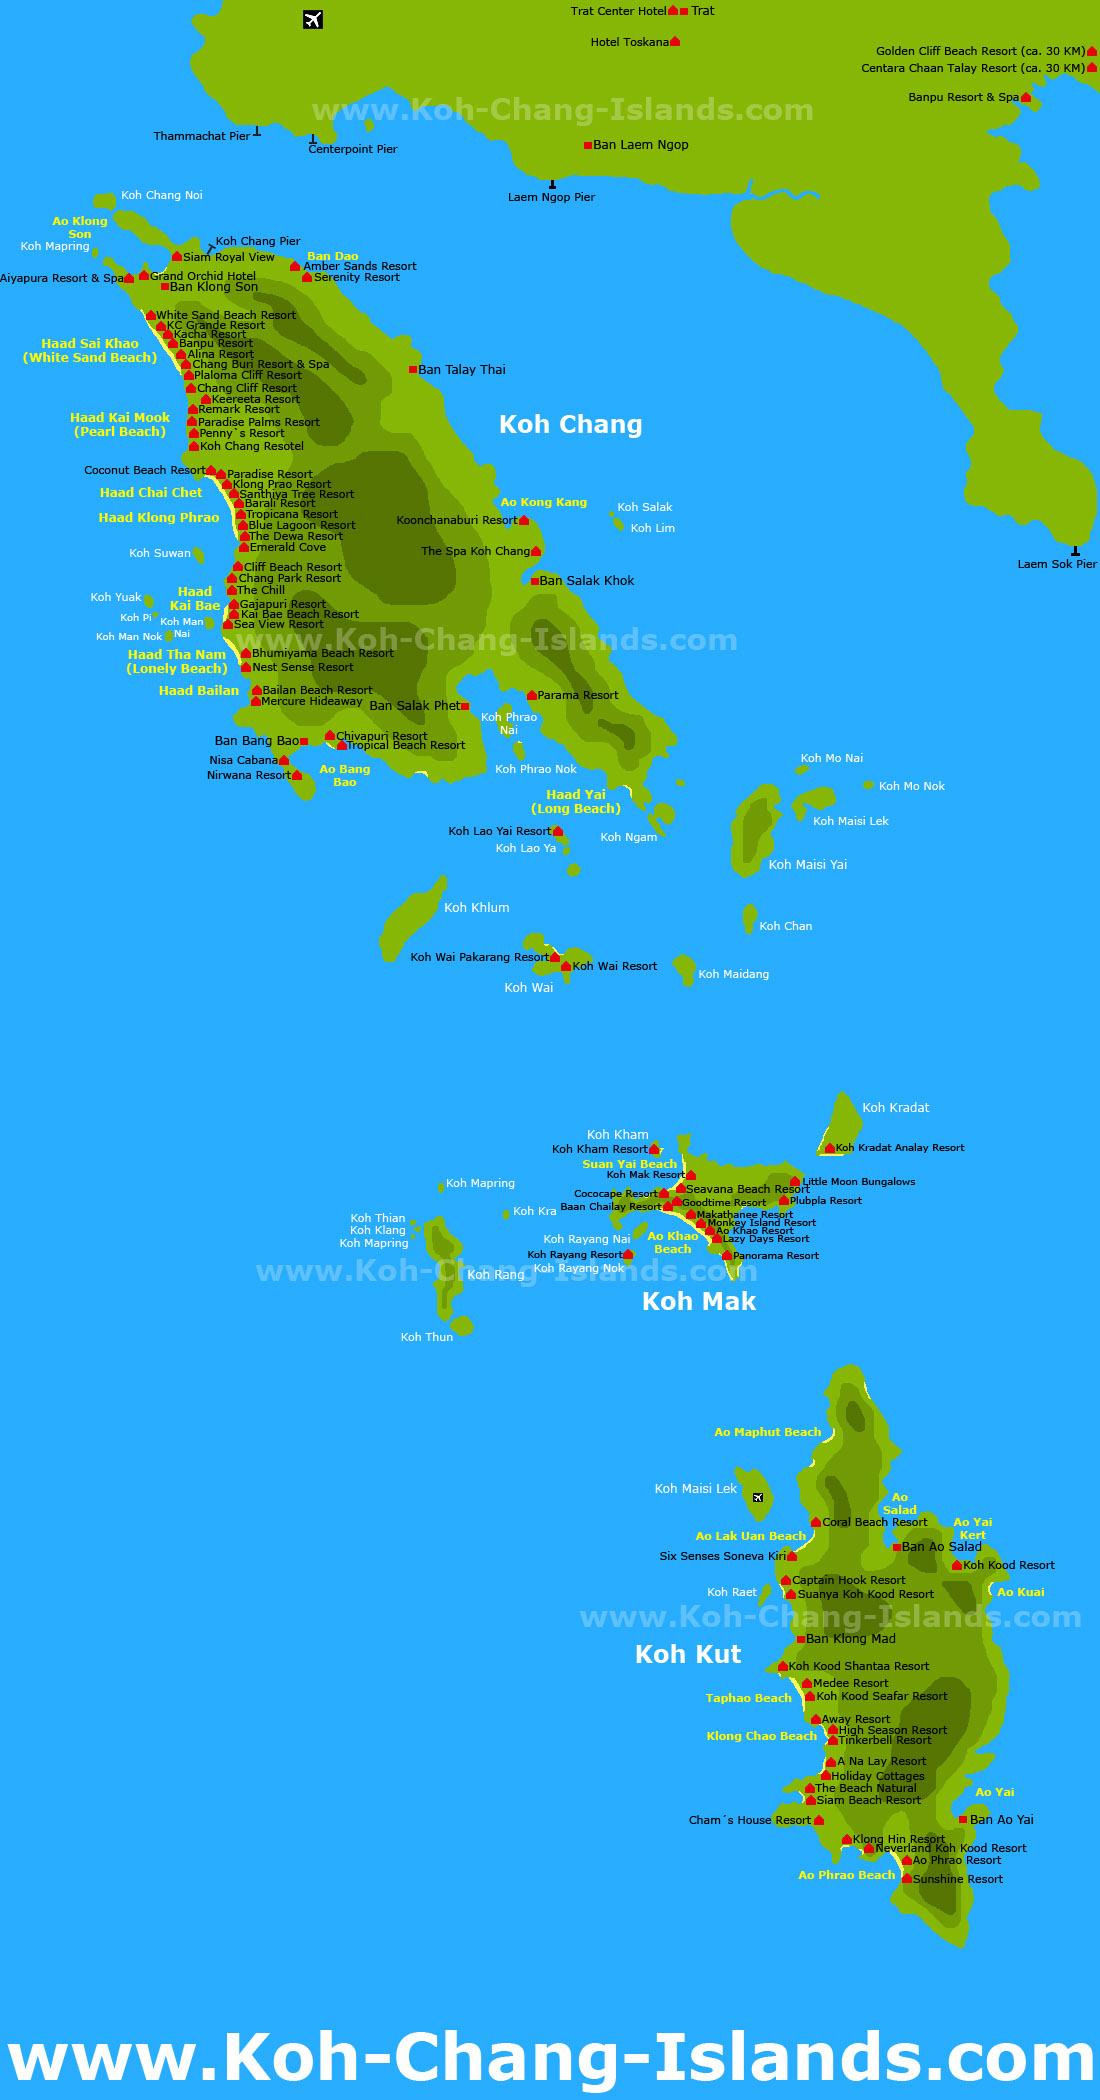 Trat Karte